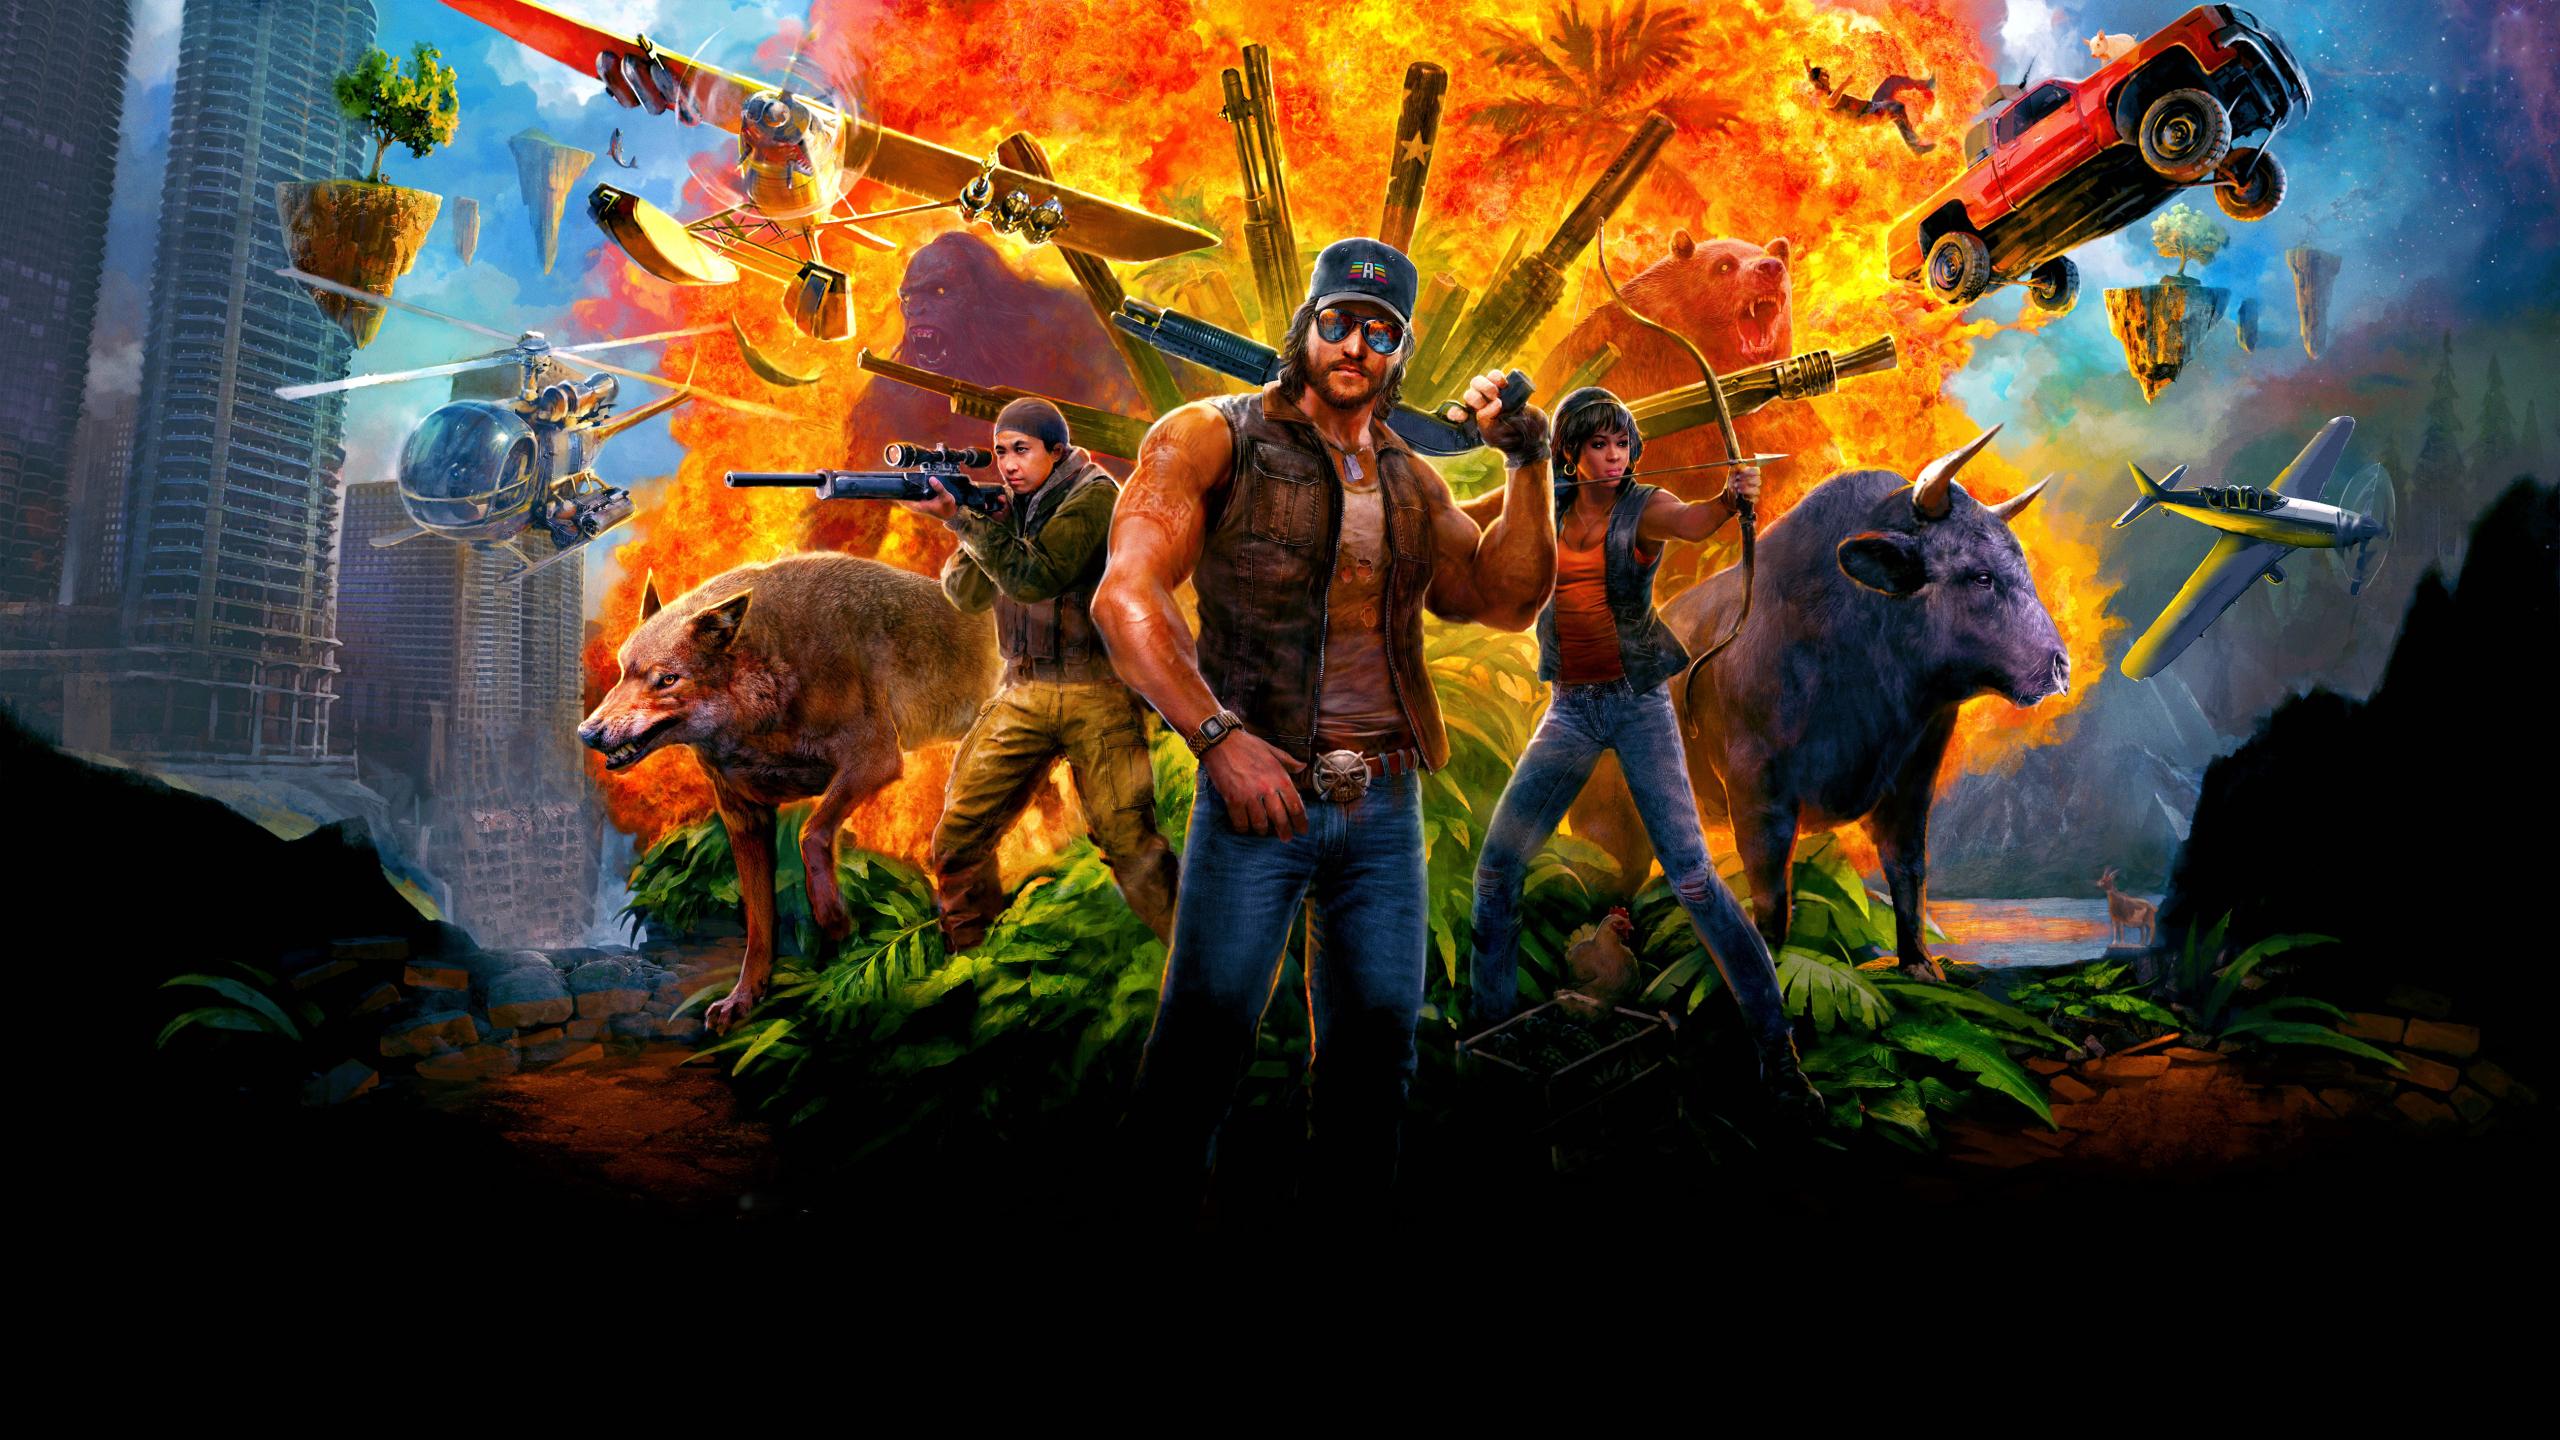 2560x1440 Far Cry 5 Game 1440p Resolution Wallpaper Hd Games 4k